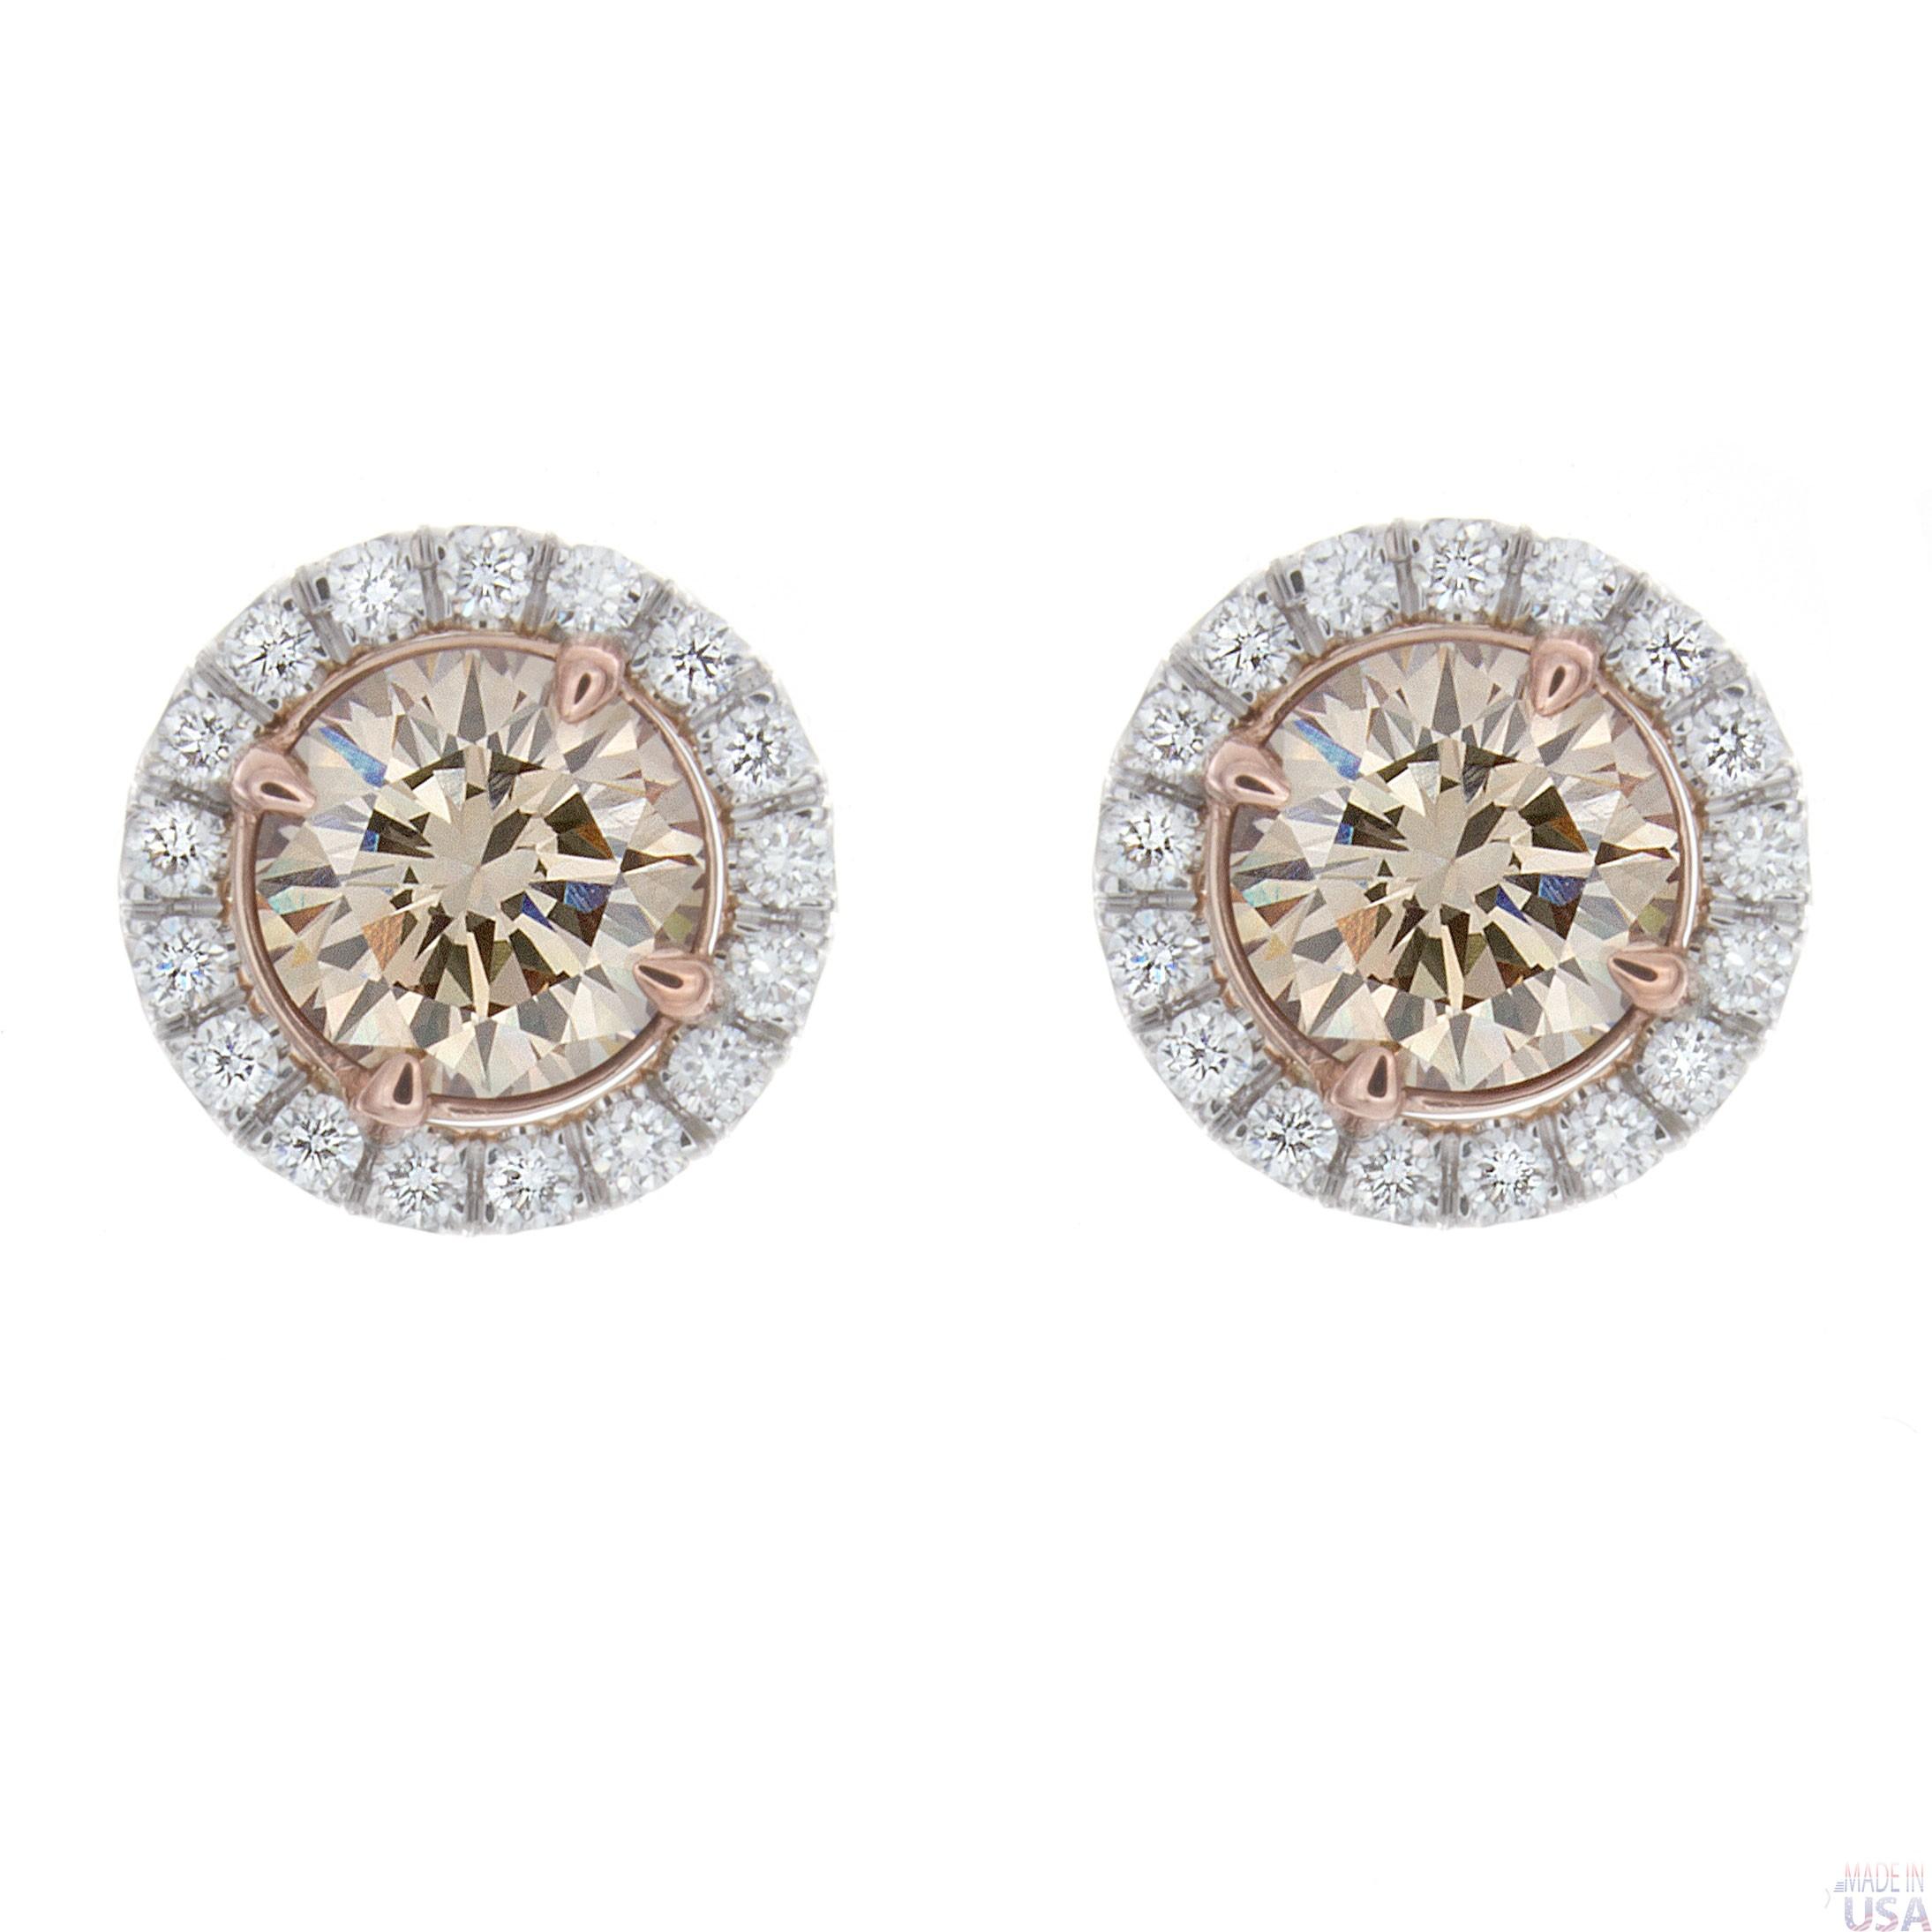 Champagne Diamond Stud Earrings 14k Yellow Gold Champagne Diamond